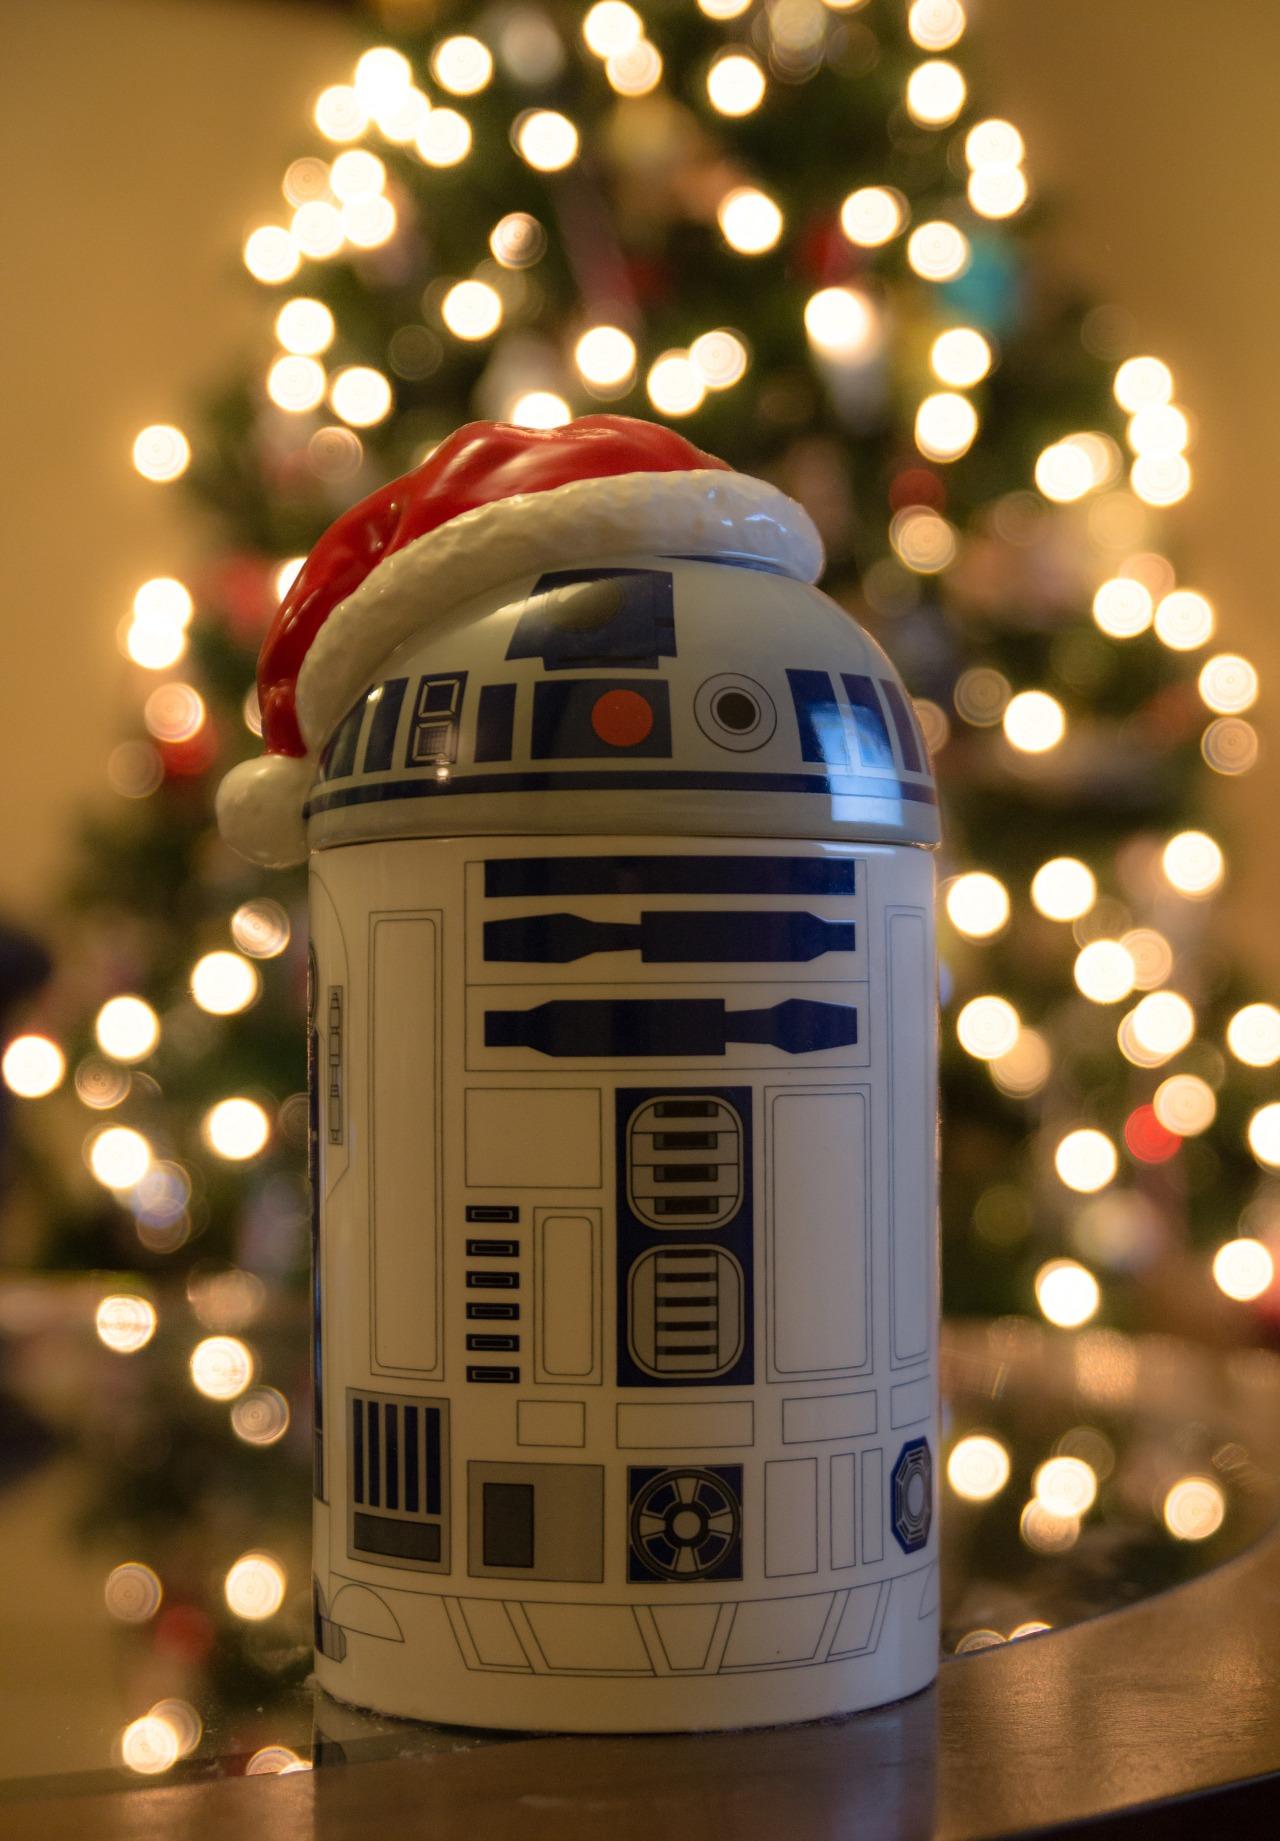 Star Wars R2-D2 Christmas cheer!   -MB